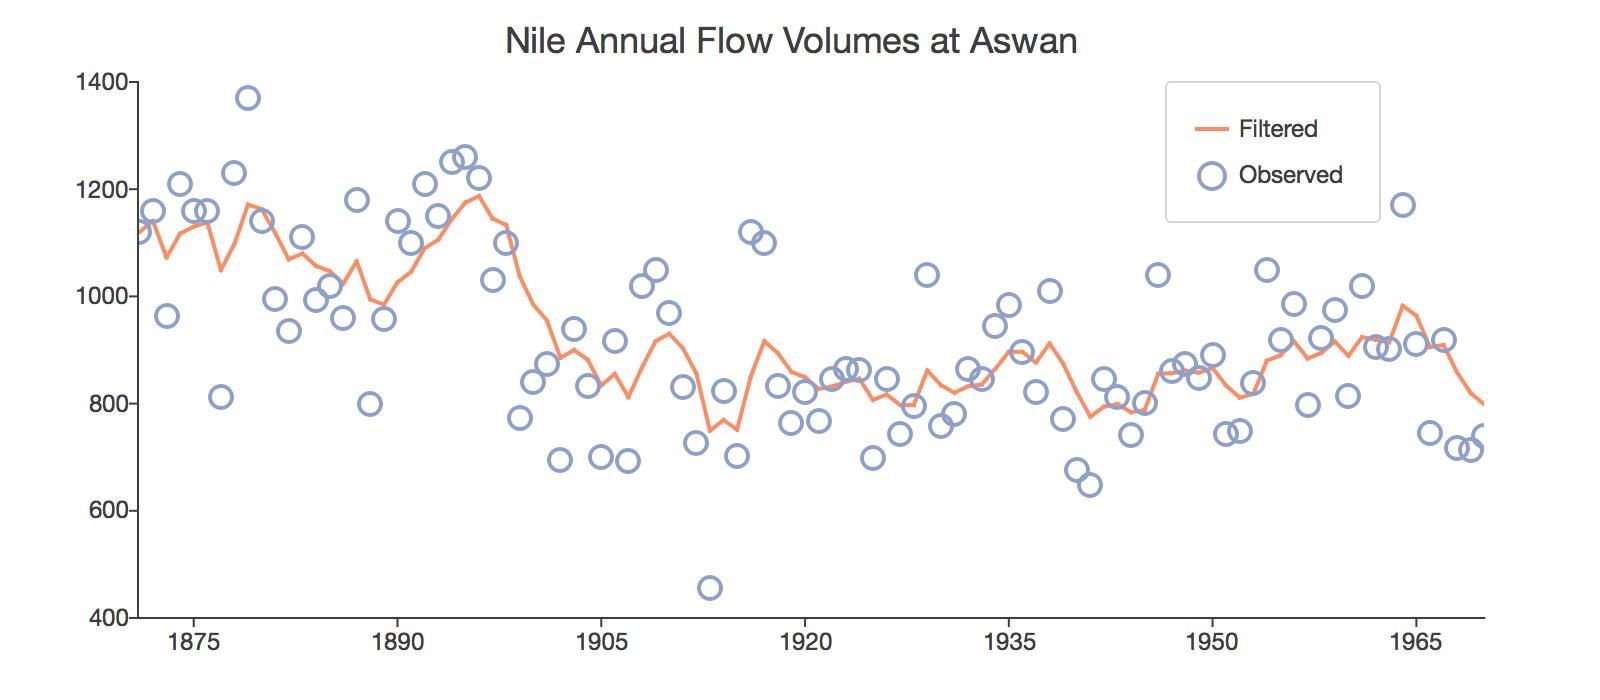 Nile River Flow Kalman Filtering